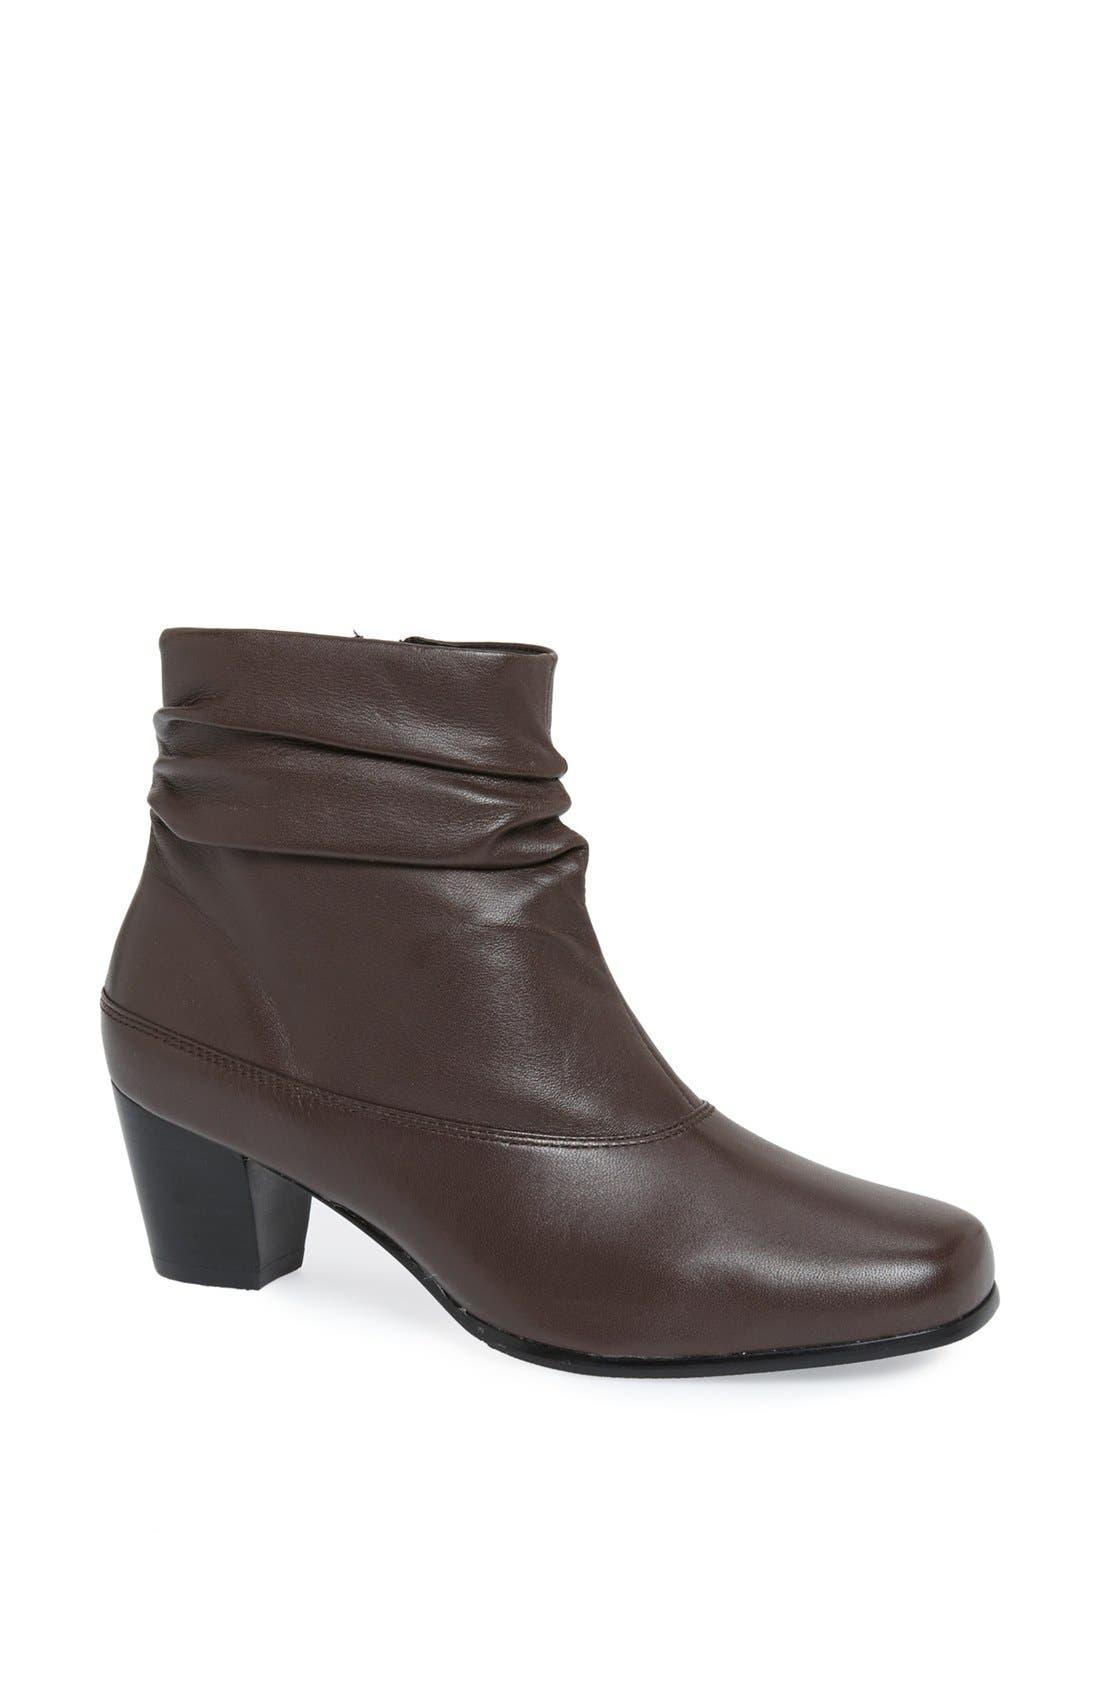 DAVID TATE Vera Boot